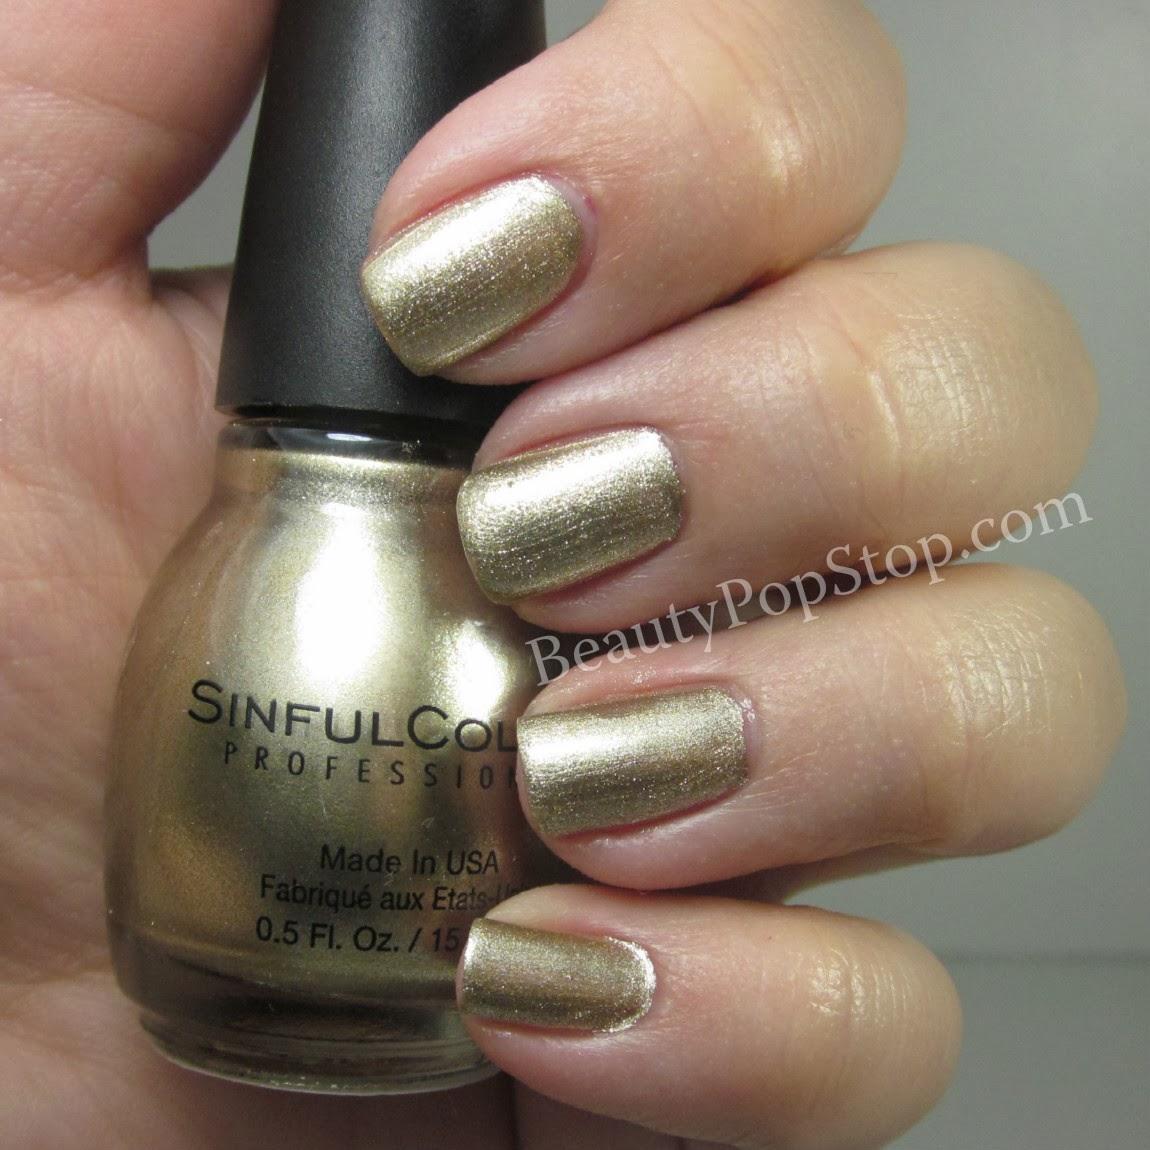 BeautyPopStop: SinfulColors Mirror Metallics Swatches And